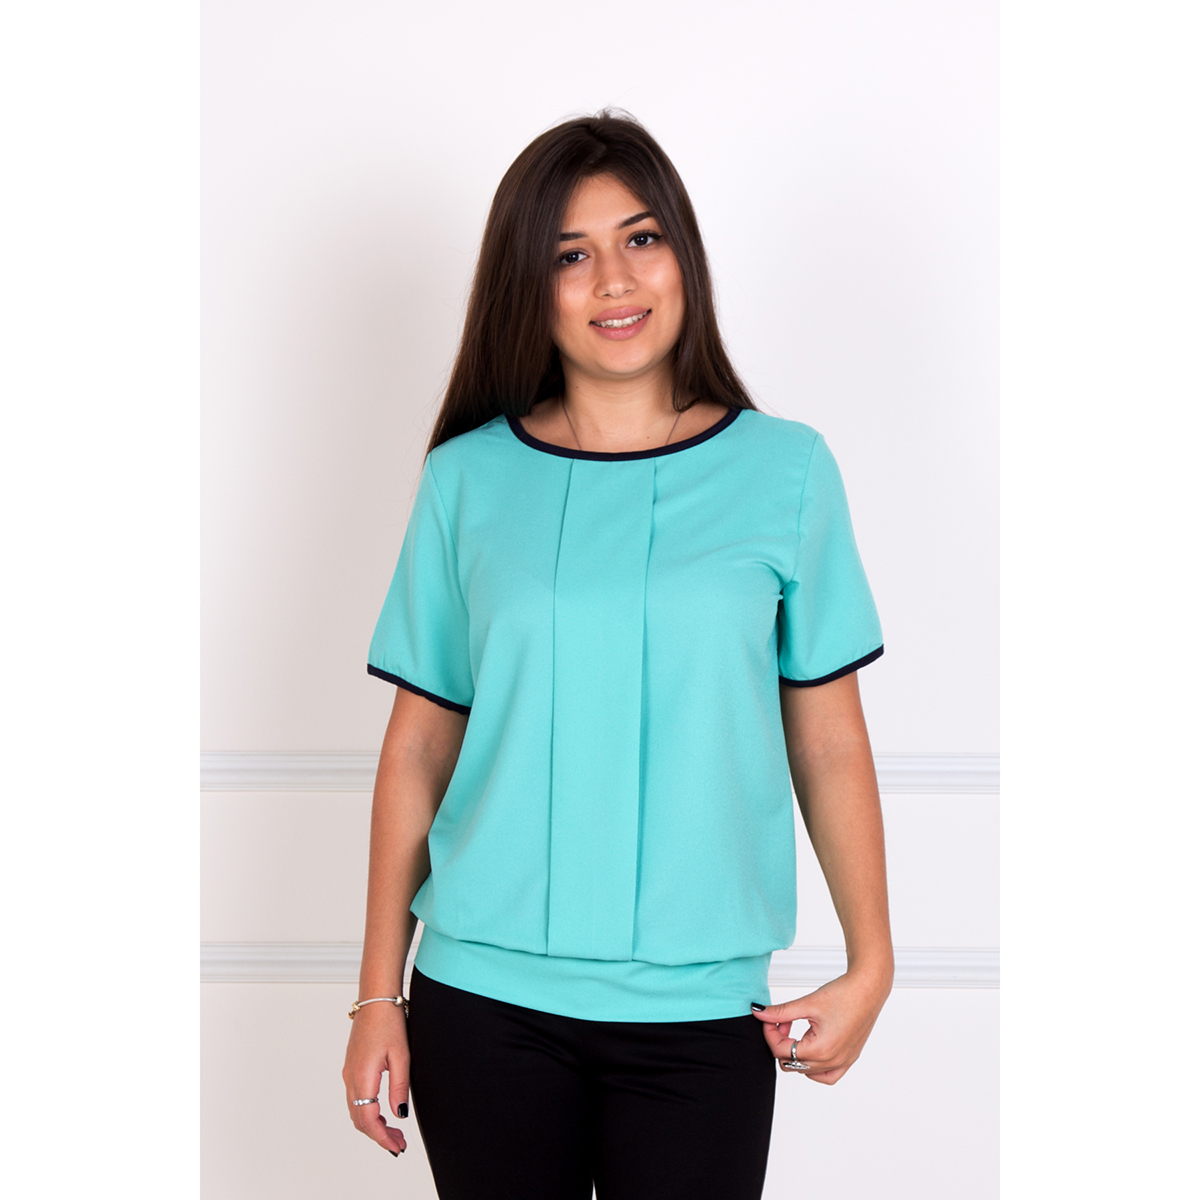 Женская блуза Кира Бирюзовый, размер 44Блузы<br>Обхват груди: 88 см <br>Обхват талии: 68 см <br>Обхват бедер: 96 см <br>Рост: 167 см<br><br>Тип: Жен. блуза<br>Размер: 44<br>Материал: Креп